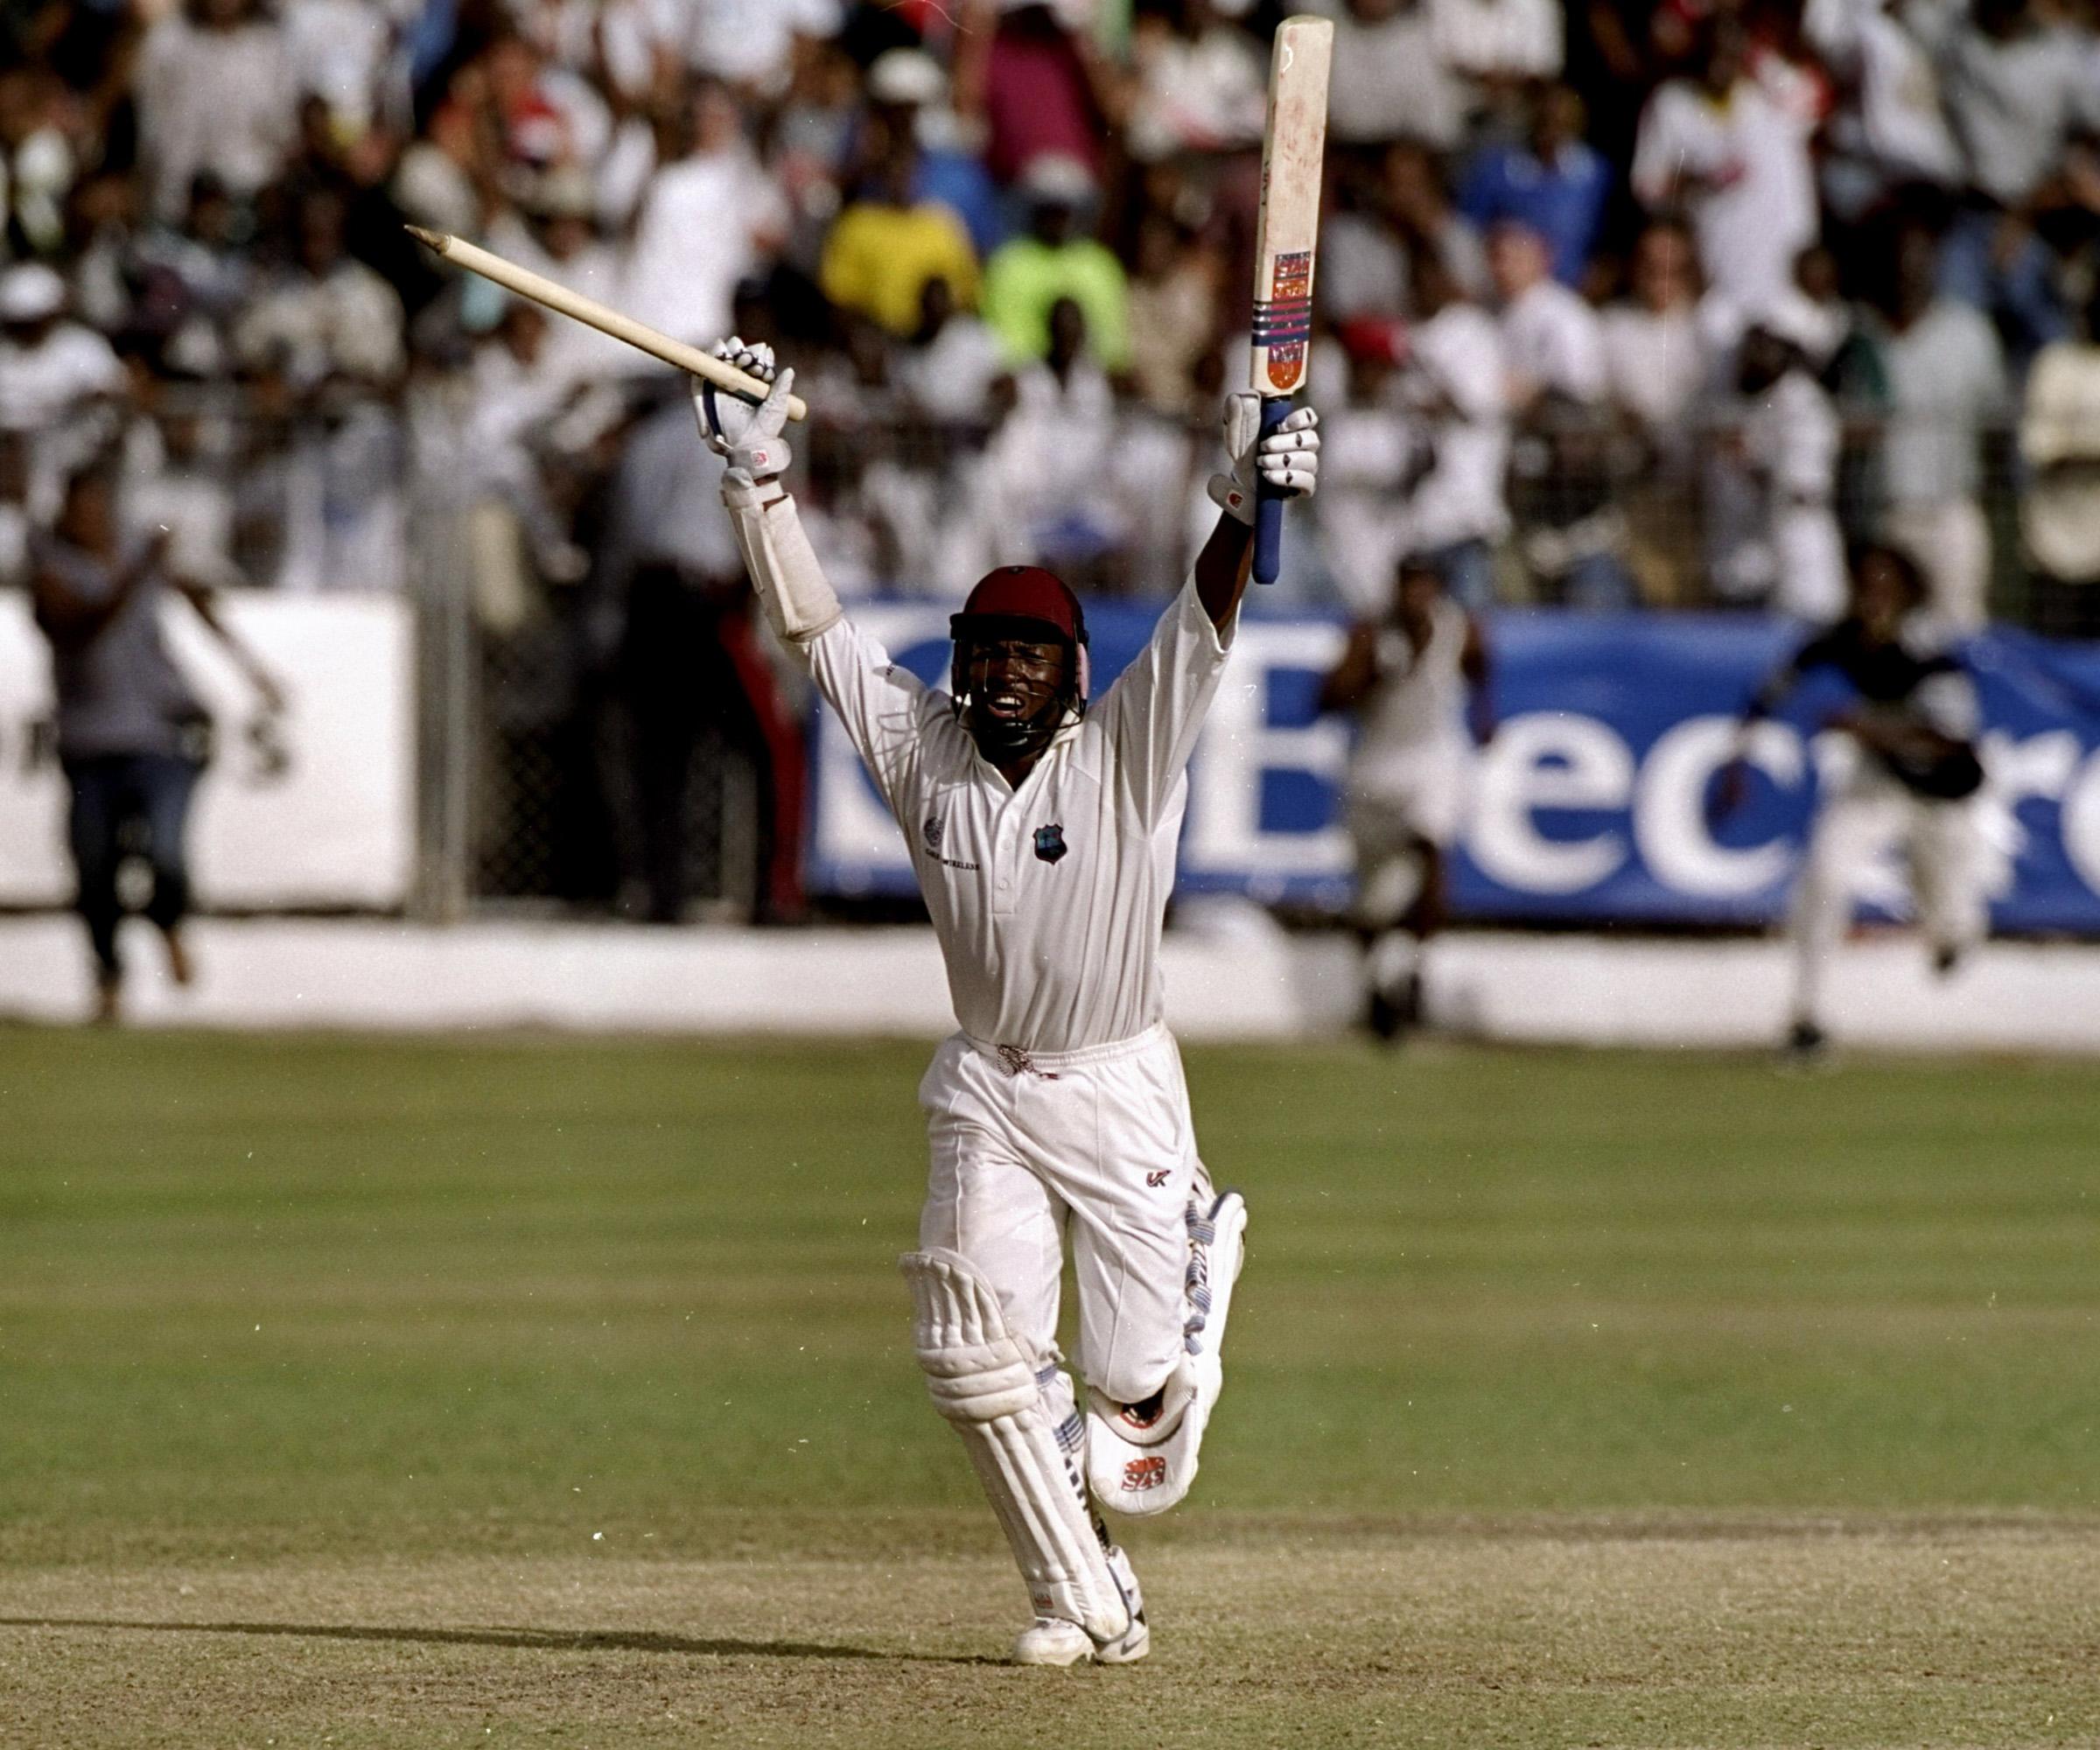 Lara celebrates the best innings of his career // Getty